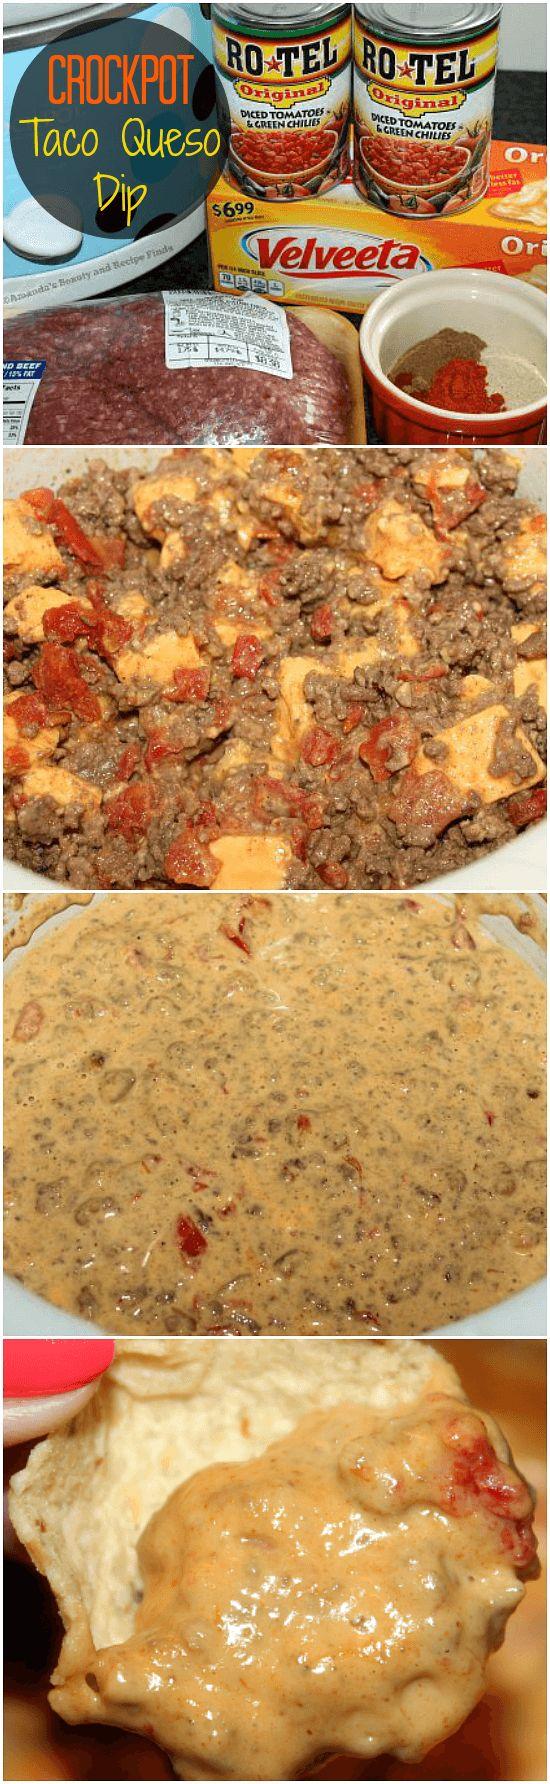 Crockpot Taco Queso Dip / myfindsonline.com